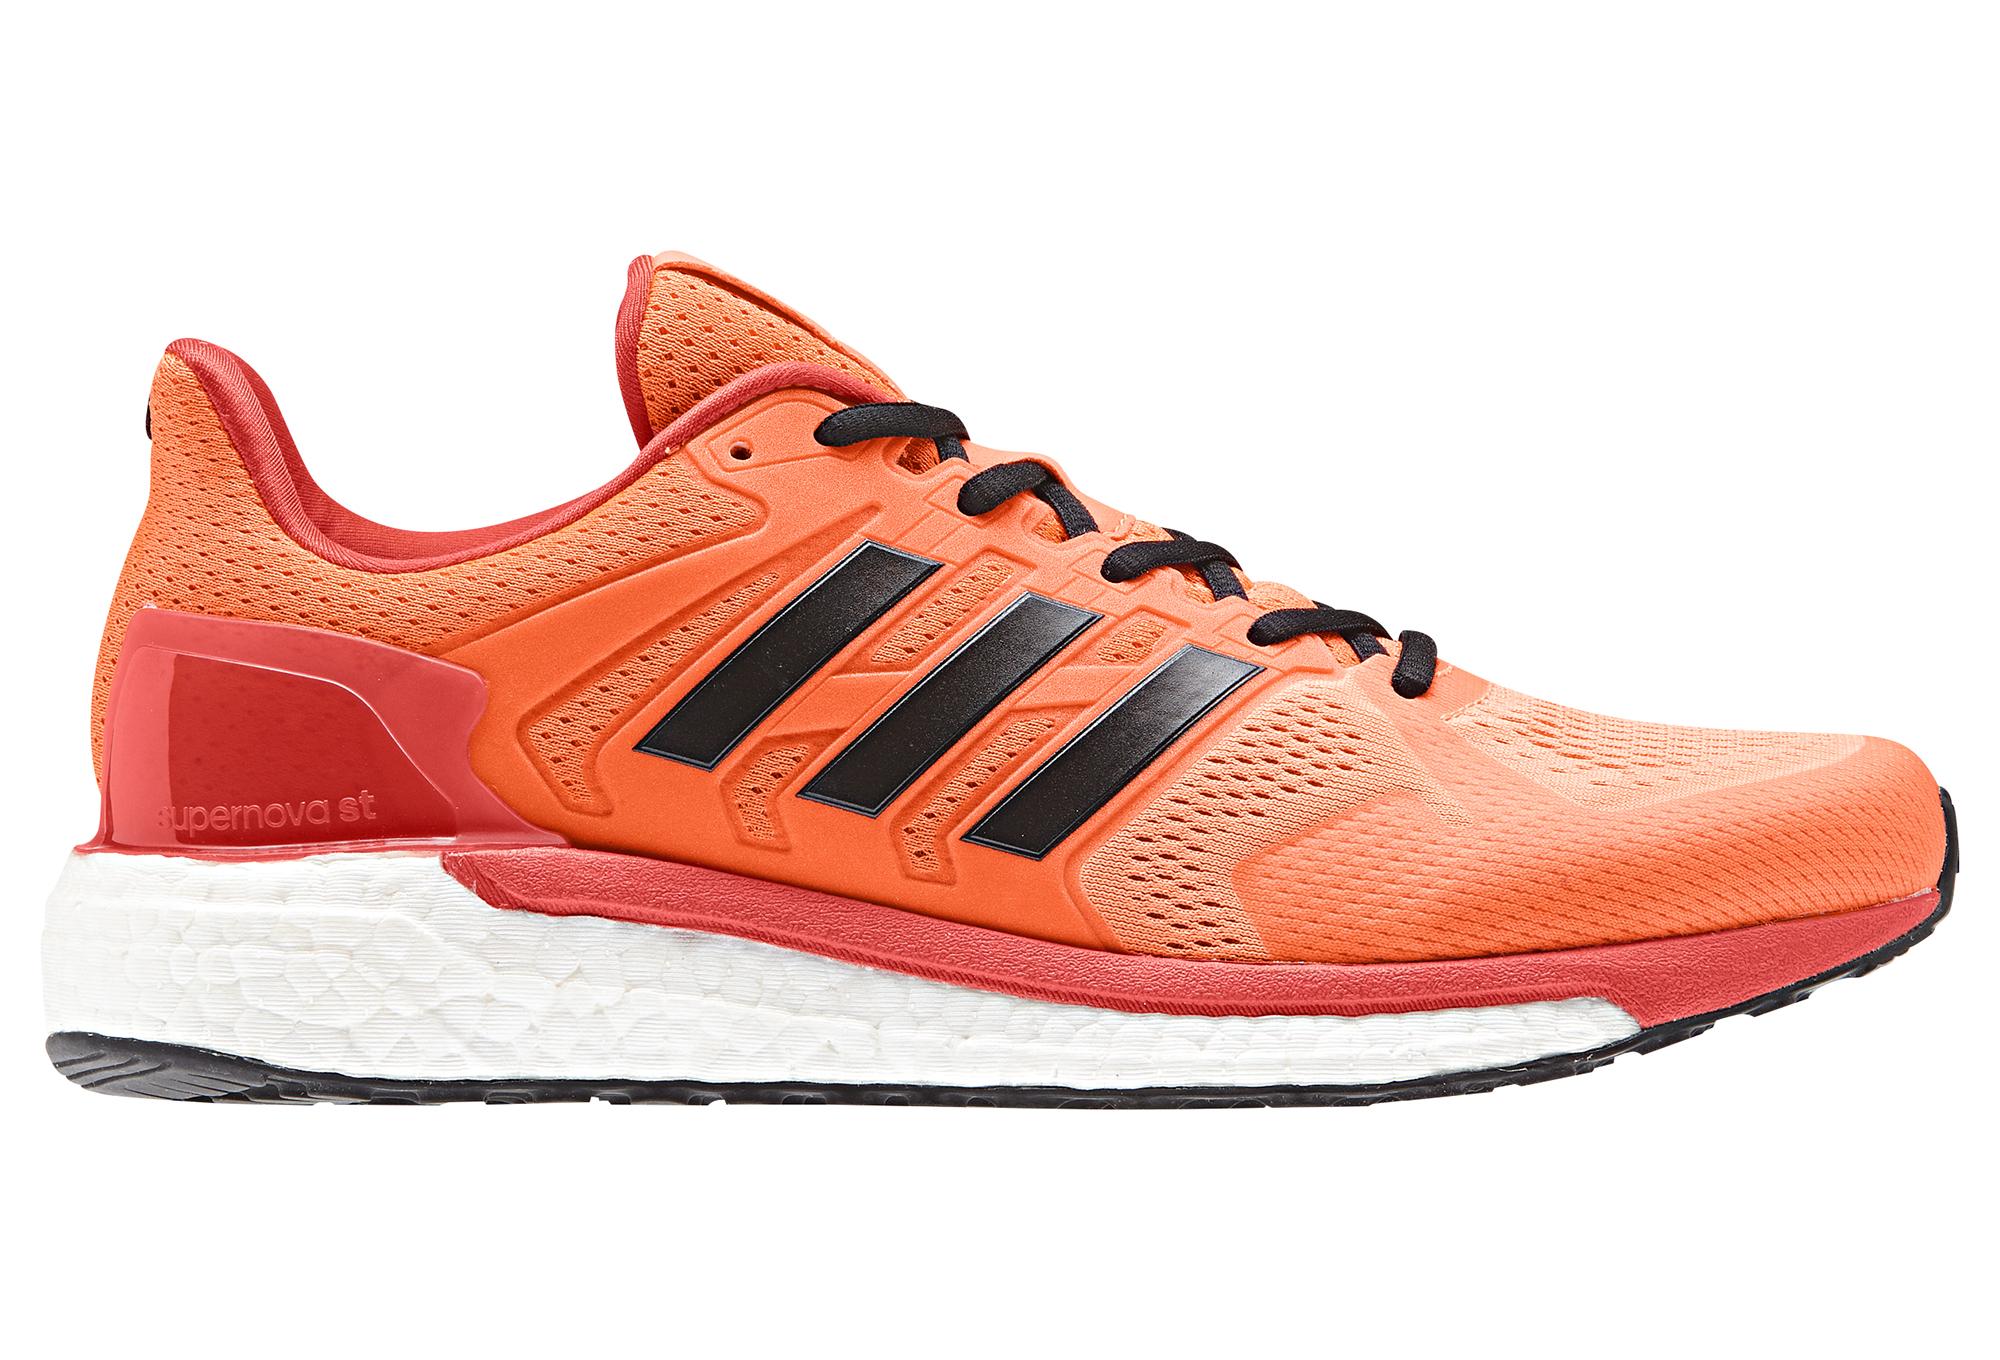 Chaussures Supernova De Running Orange St Adidas bIf6mYgyv7